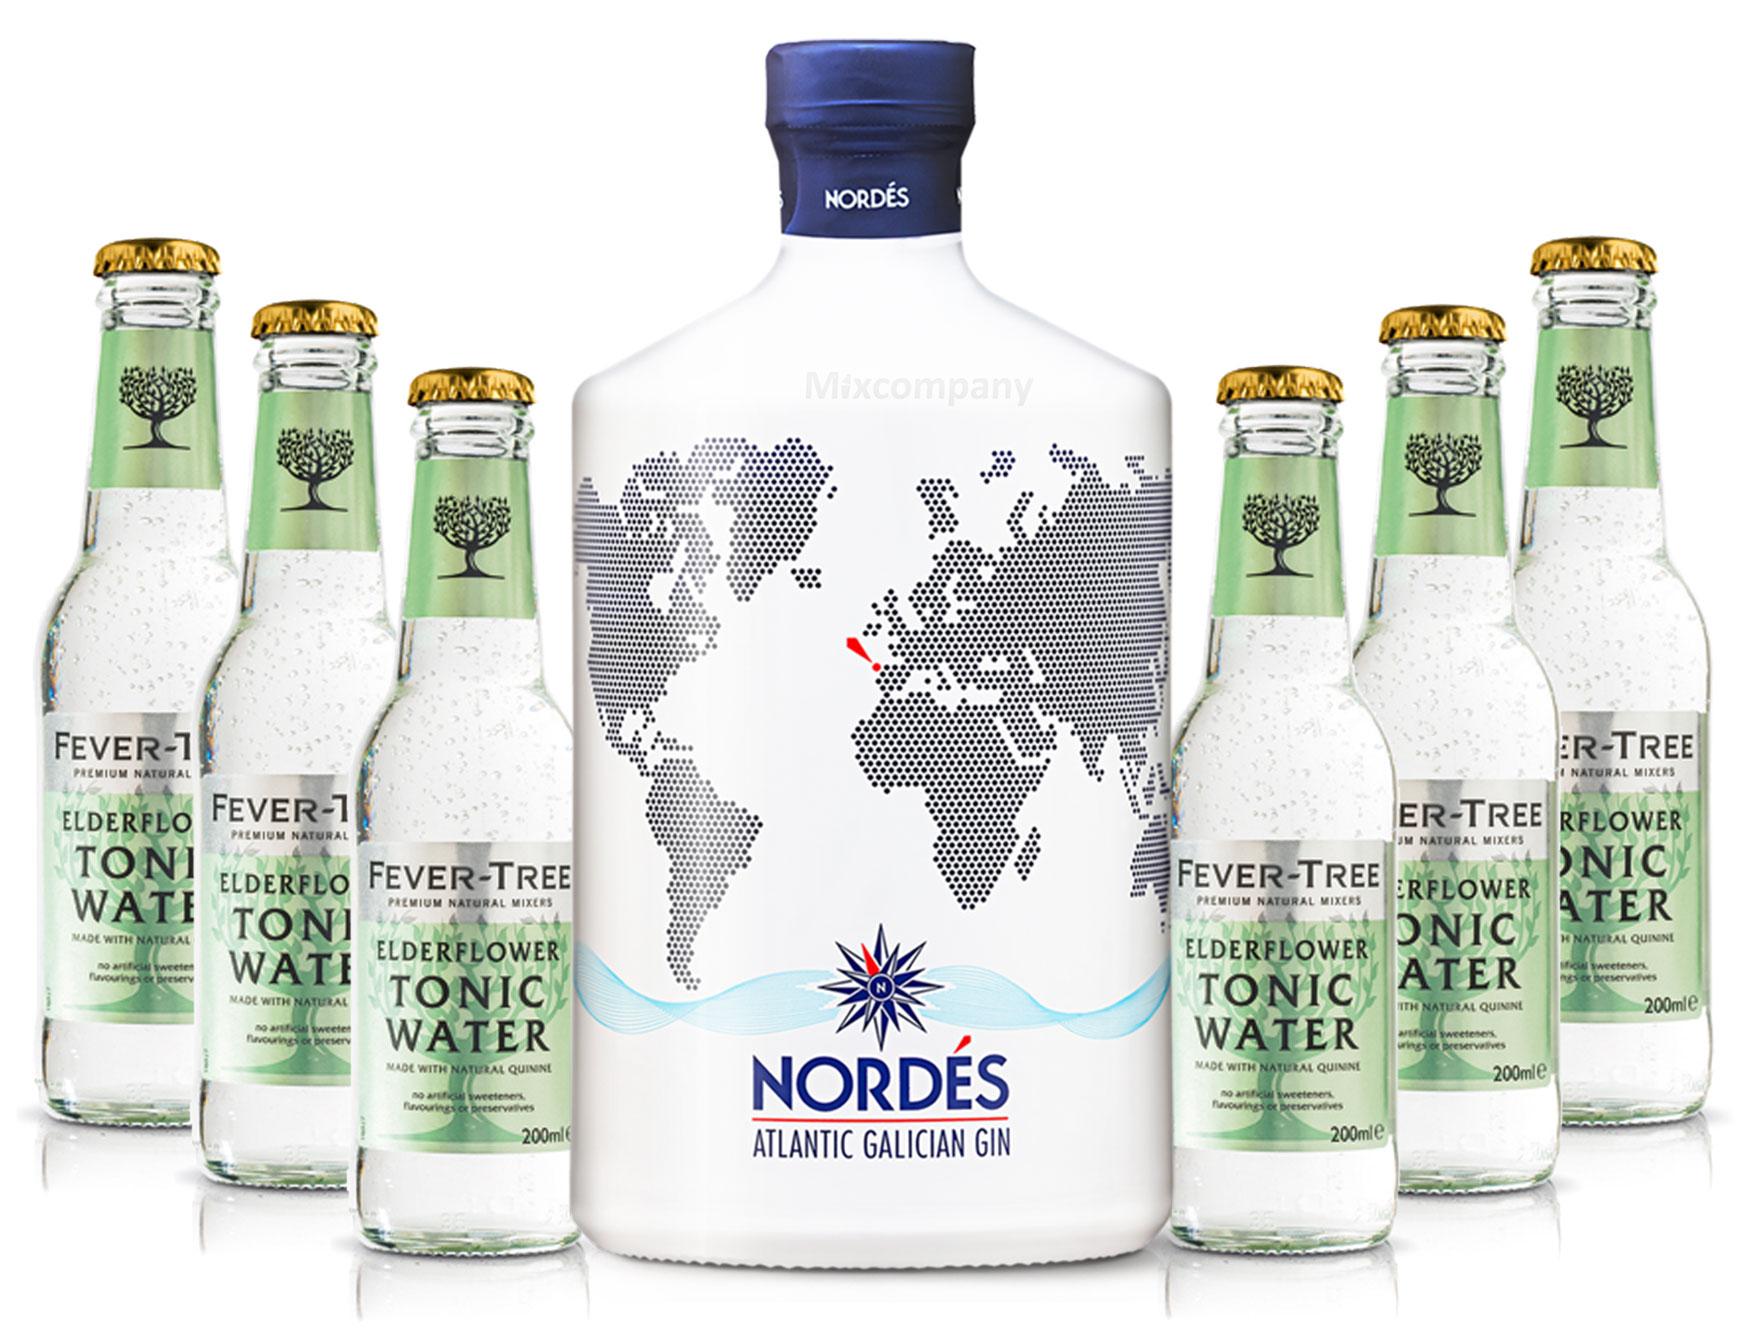 Nordes Atlantic Galician Gin aus Galizien 0,7l (40% Vol) + 6x Fever-Tree Elderflower Tonic Water 0,2l MEHRWEG inkl. Pfand- [Enthält Sulfite]